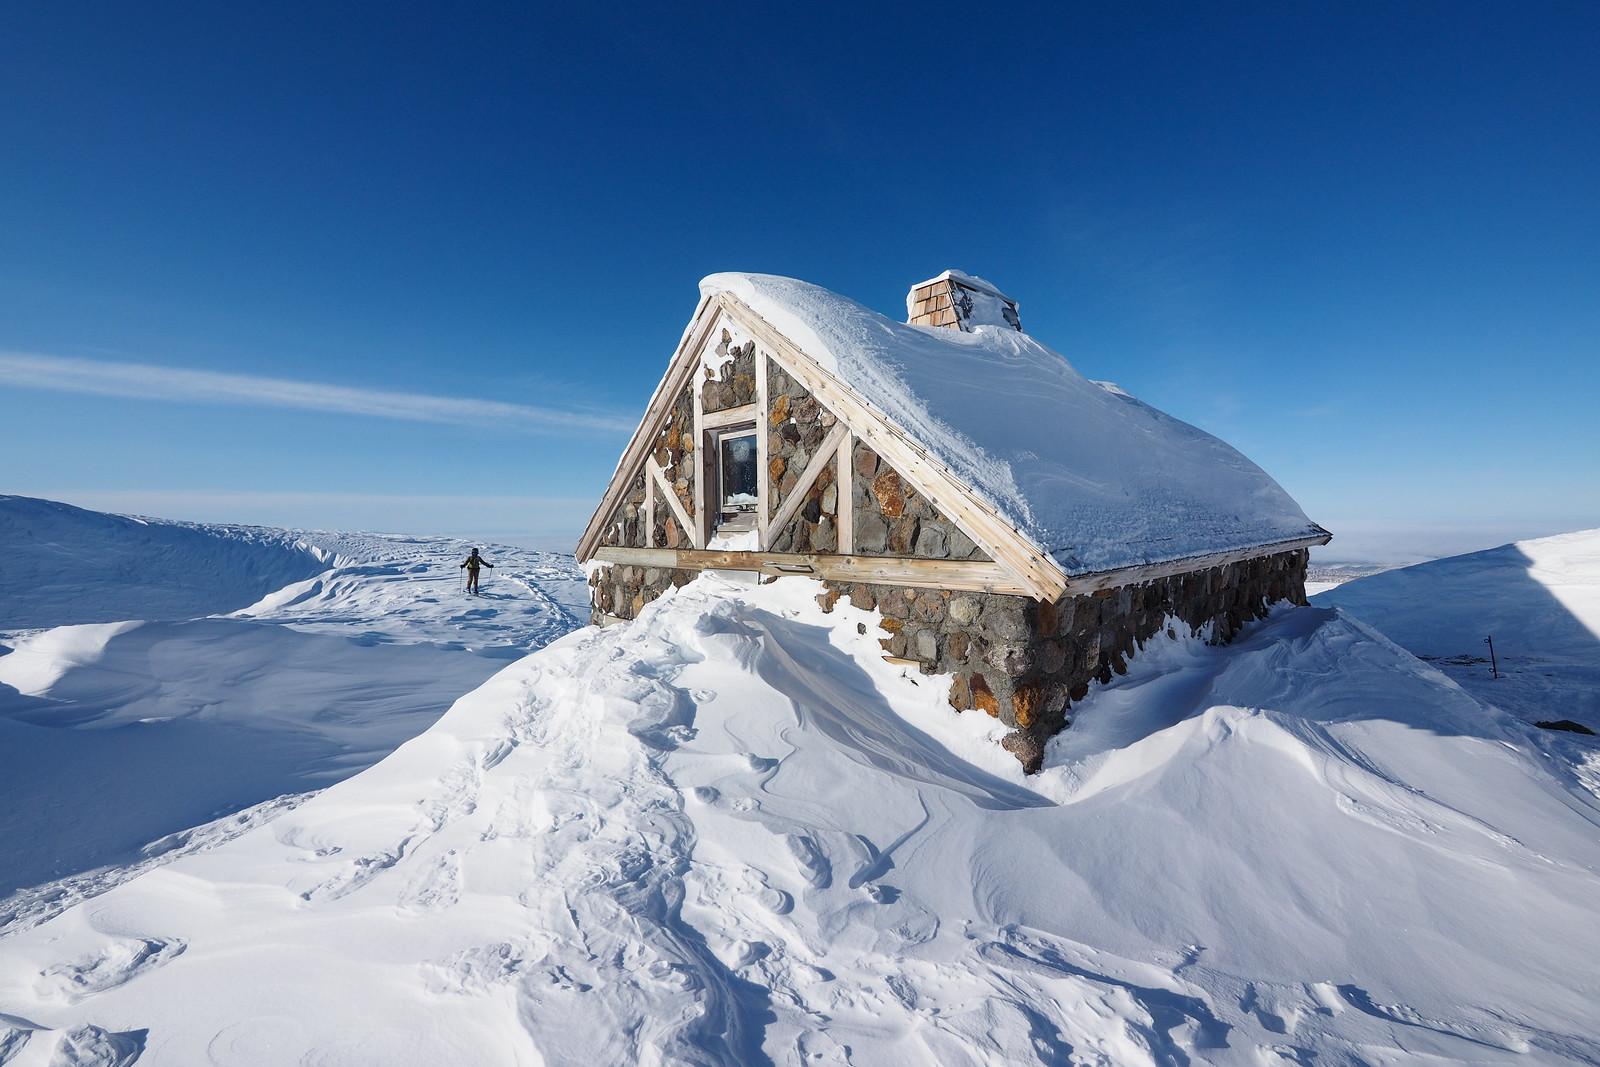 Mt. Asahi fumerole ski tour (Hokkaido, Japan)